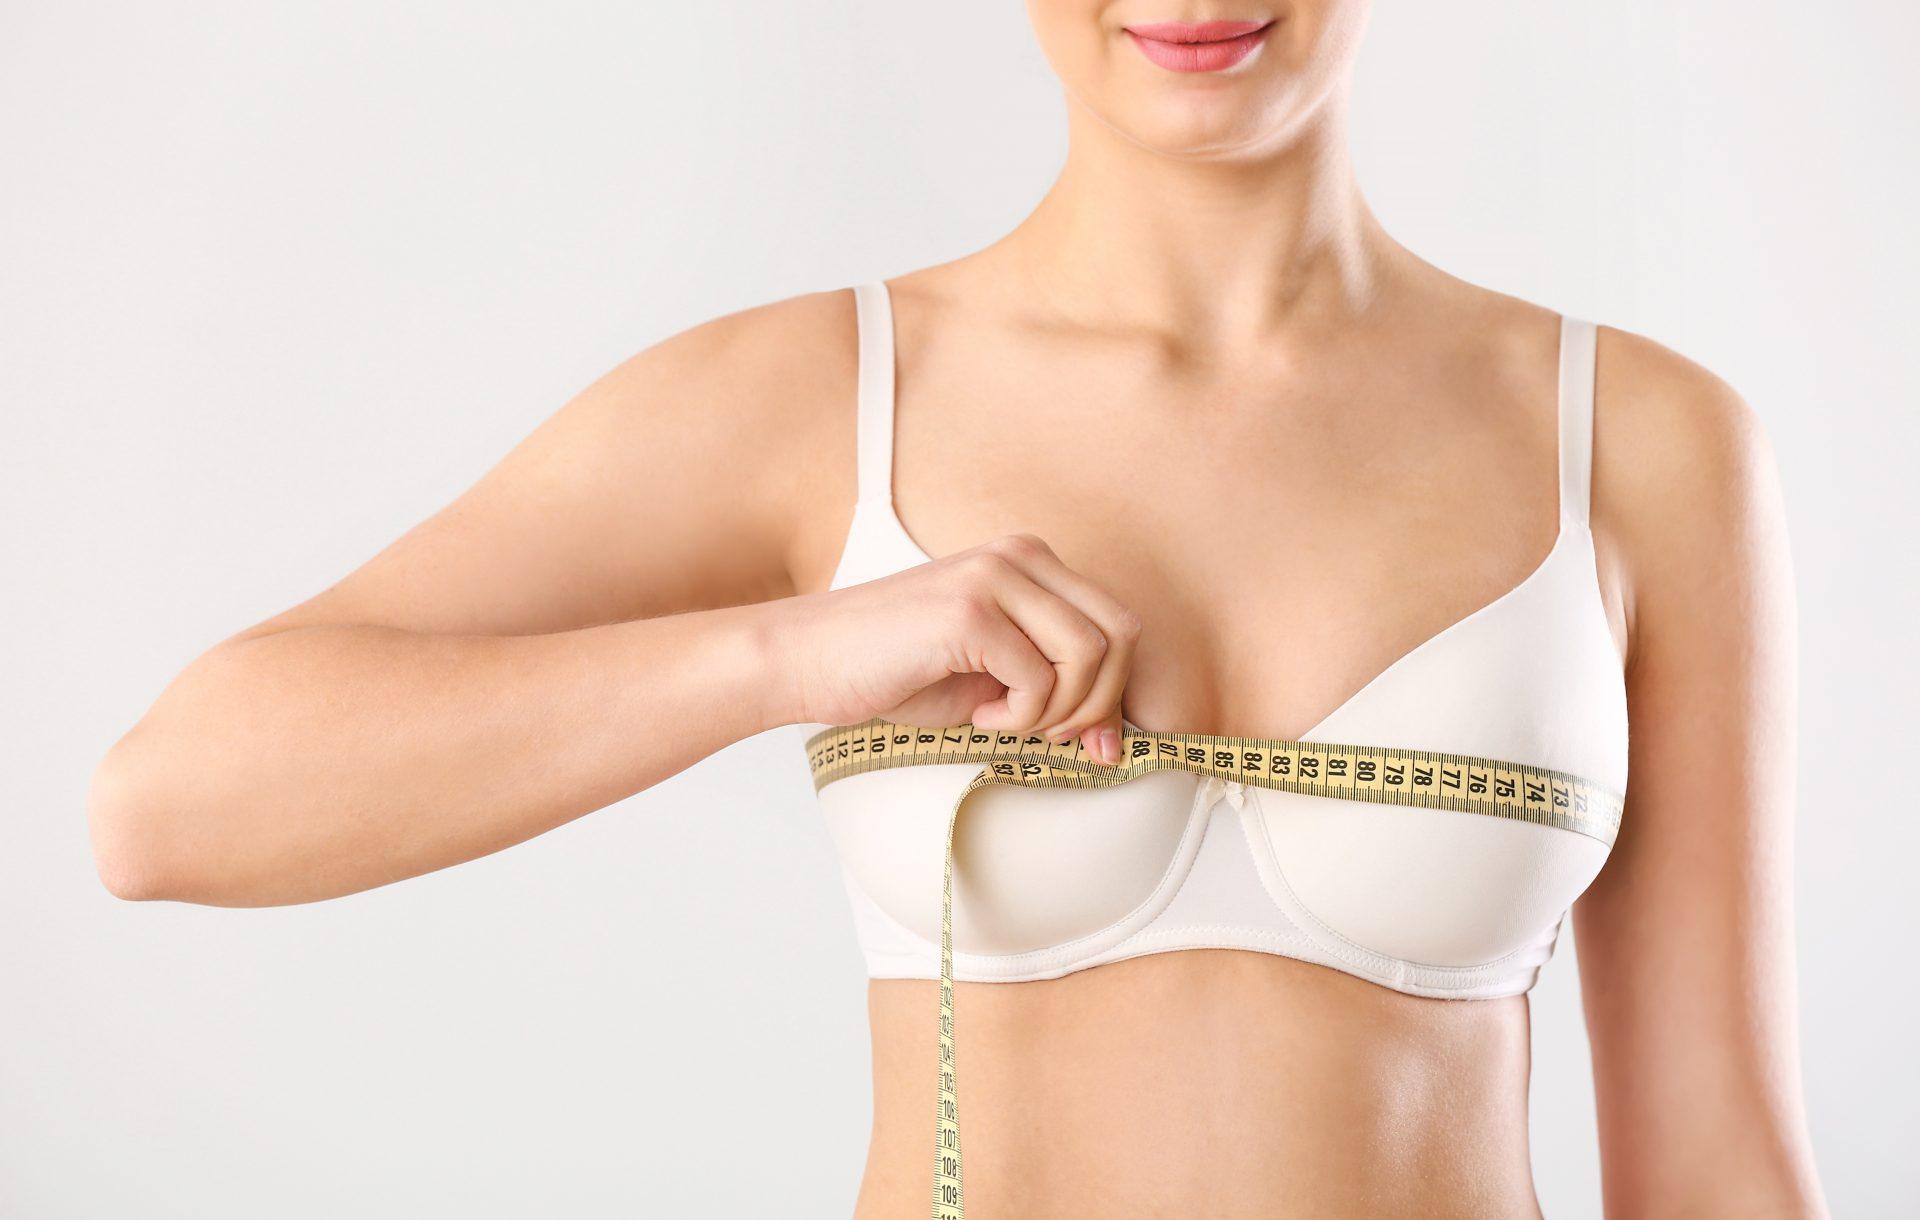 breast-augmentation-plastic-surgeon-singapore